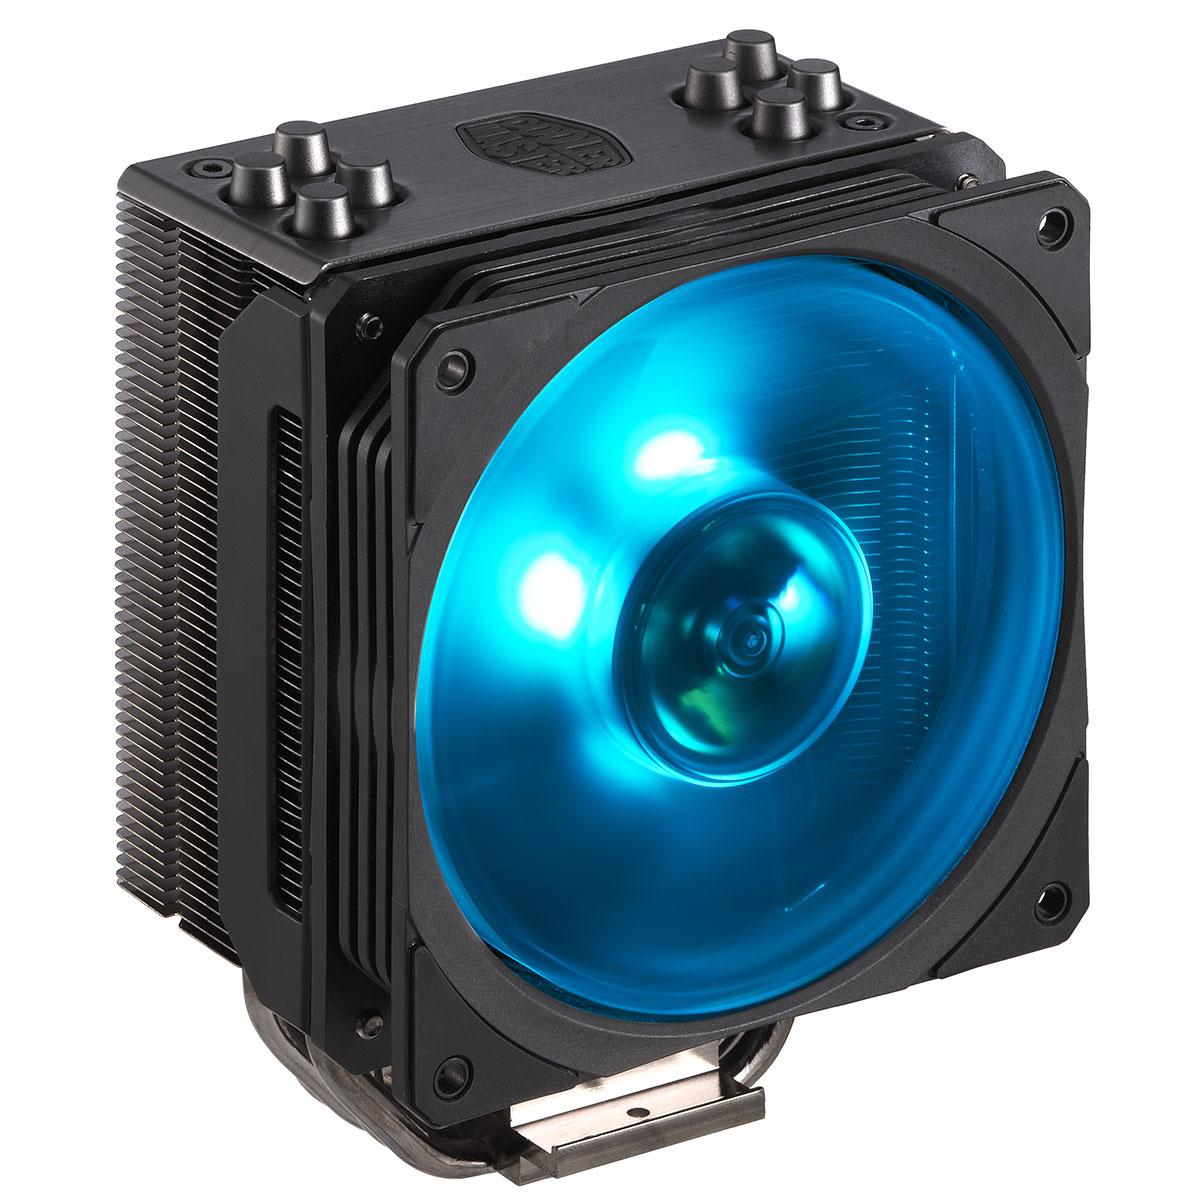 Cooler Master RR-212S-20PC-R1 - Ventilateur CPU Cooler Master - 3